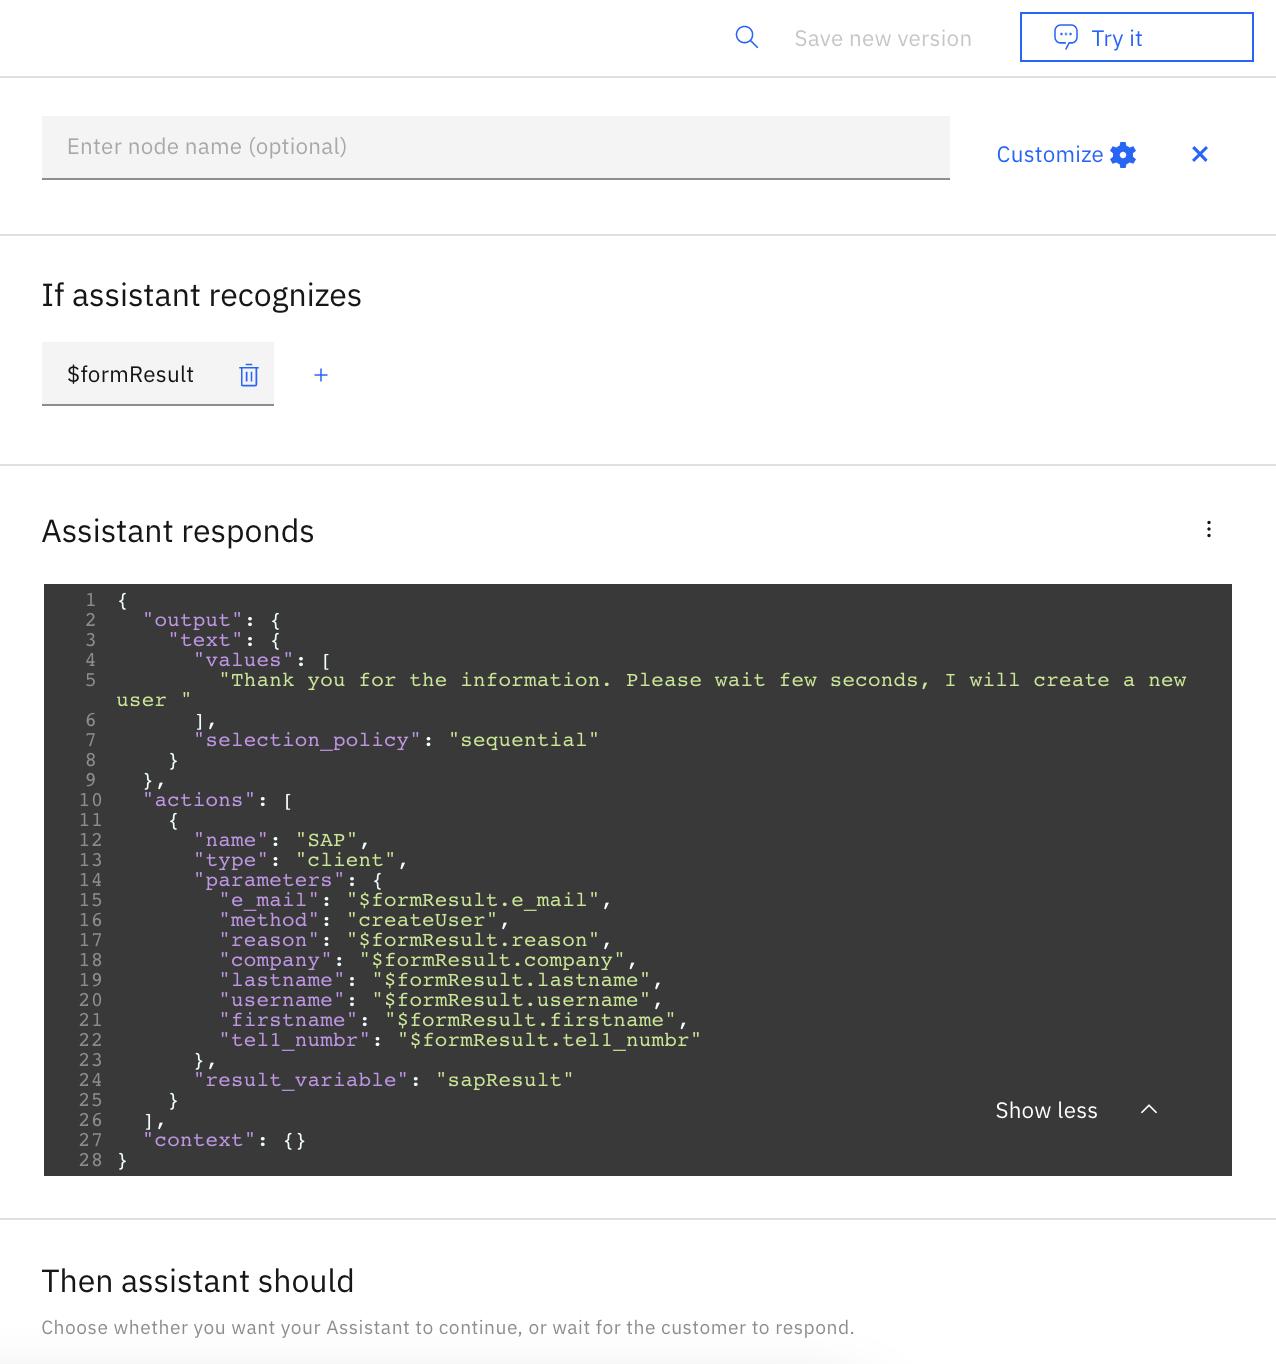 IBM Watson Assistant integration capabilities